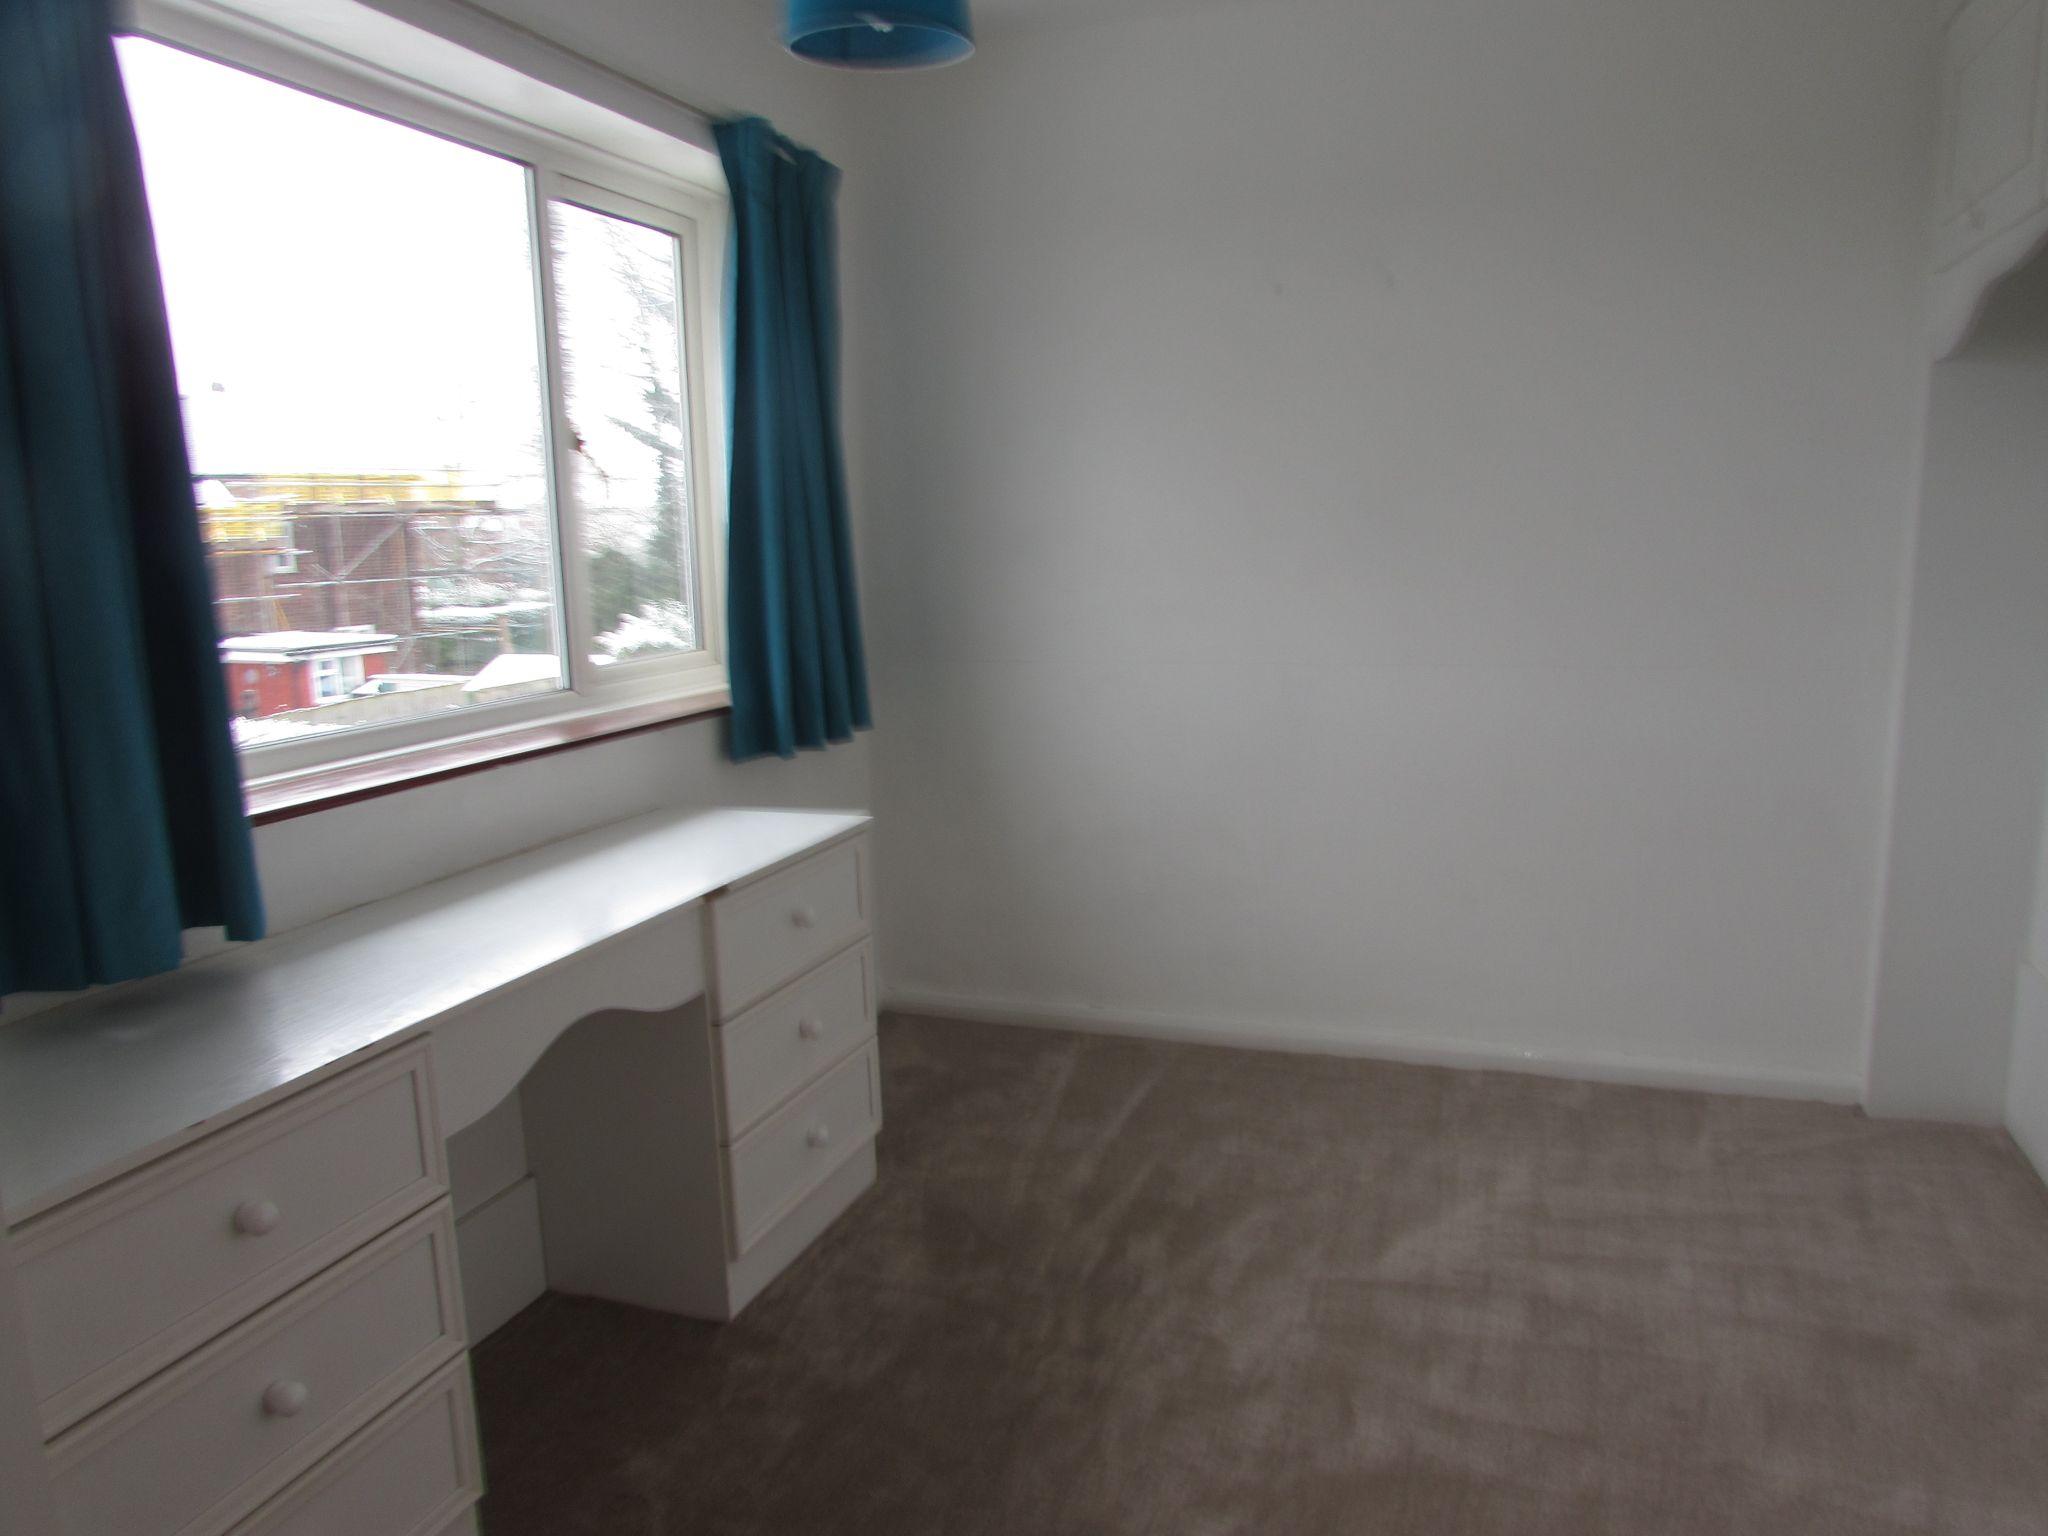 4 Bedroom End Terraced House To Rent - Bedroom 2